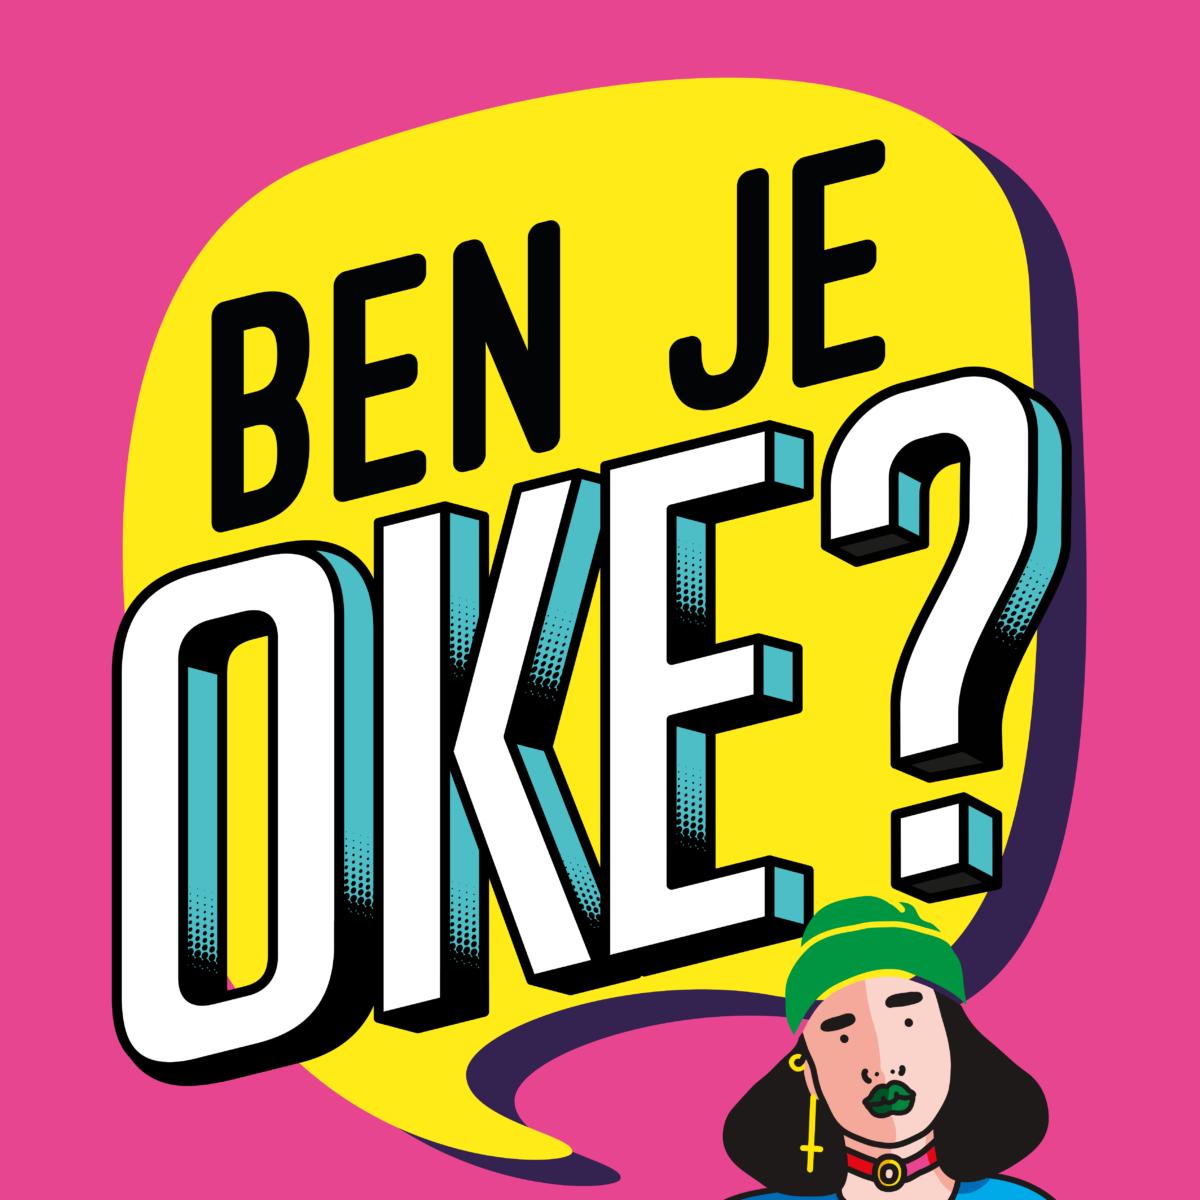 Ben je oké?